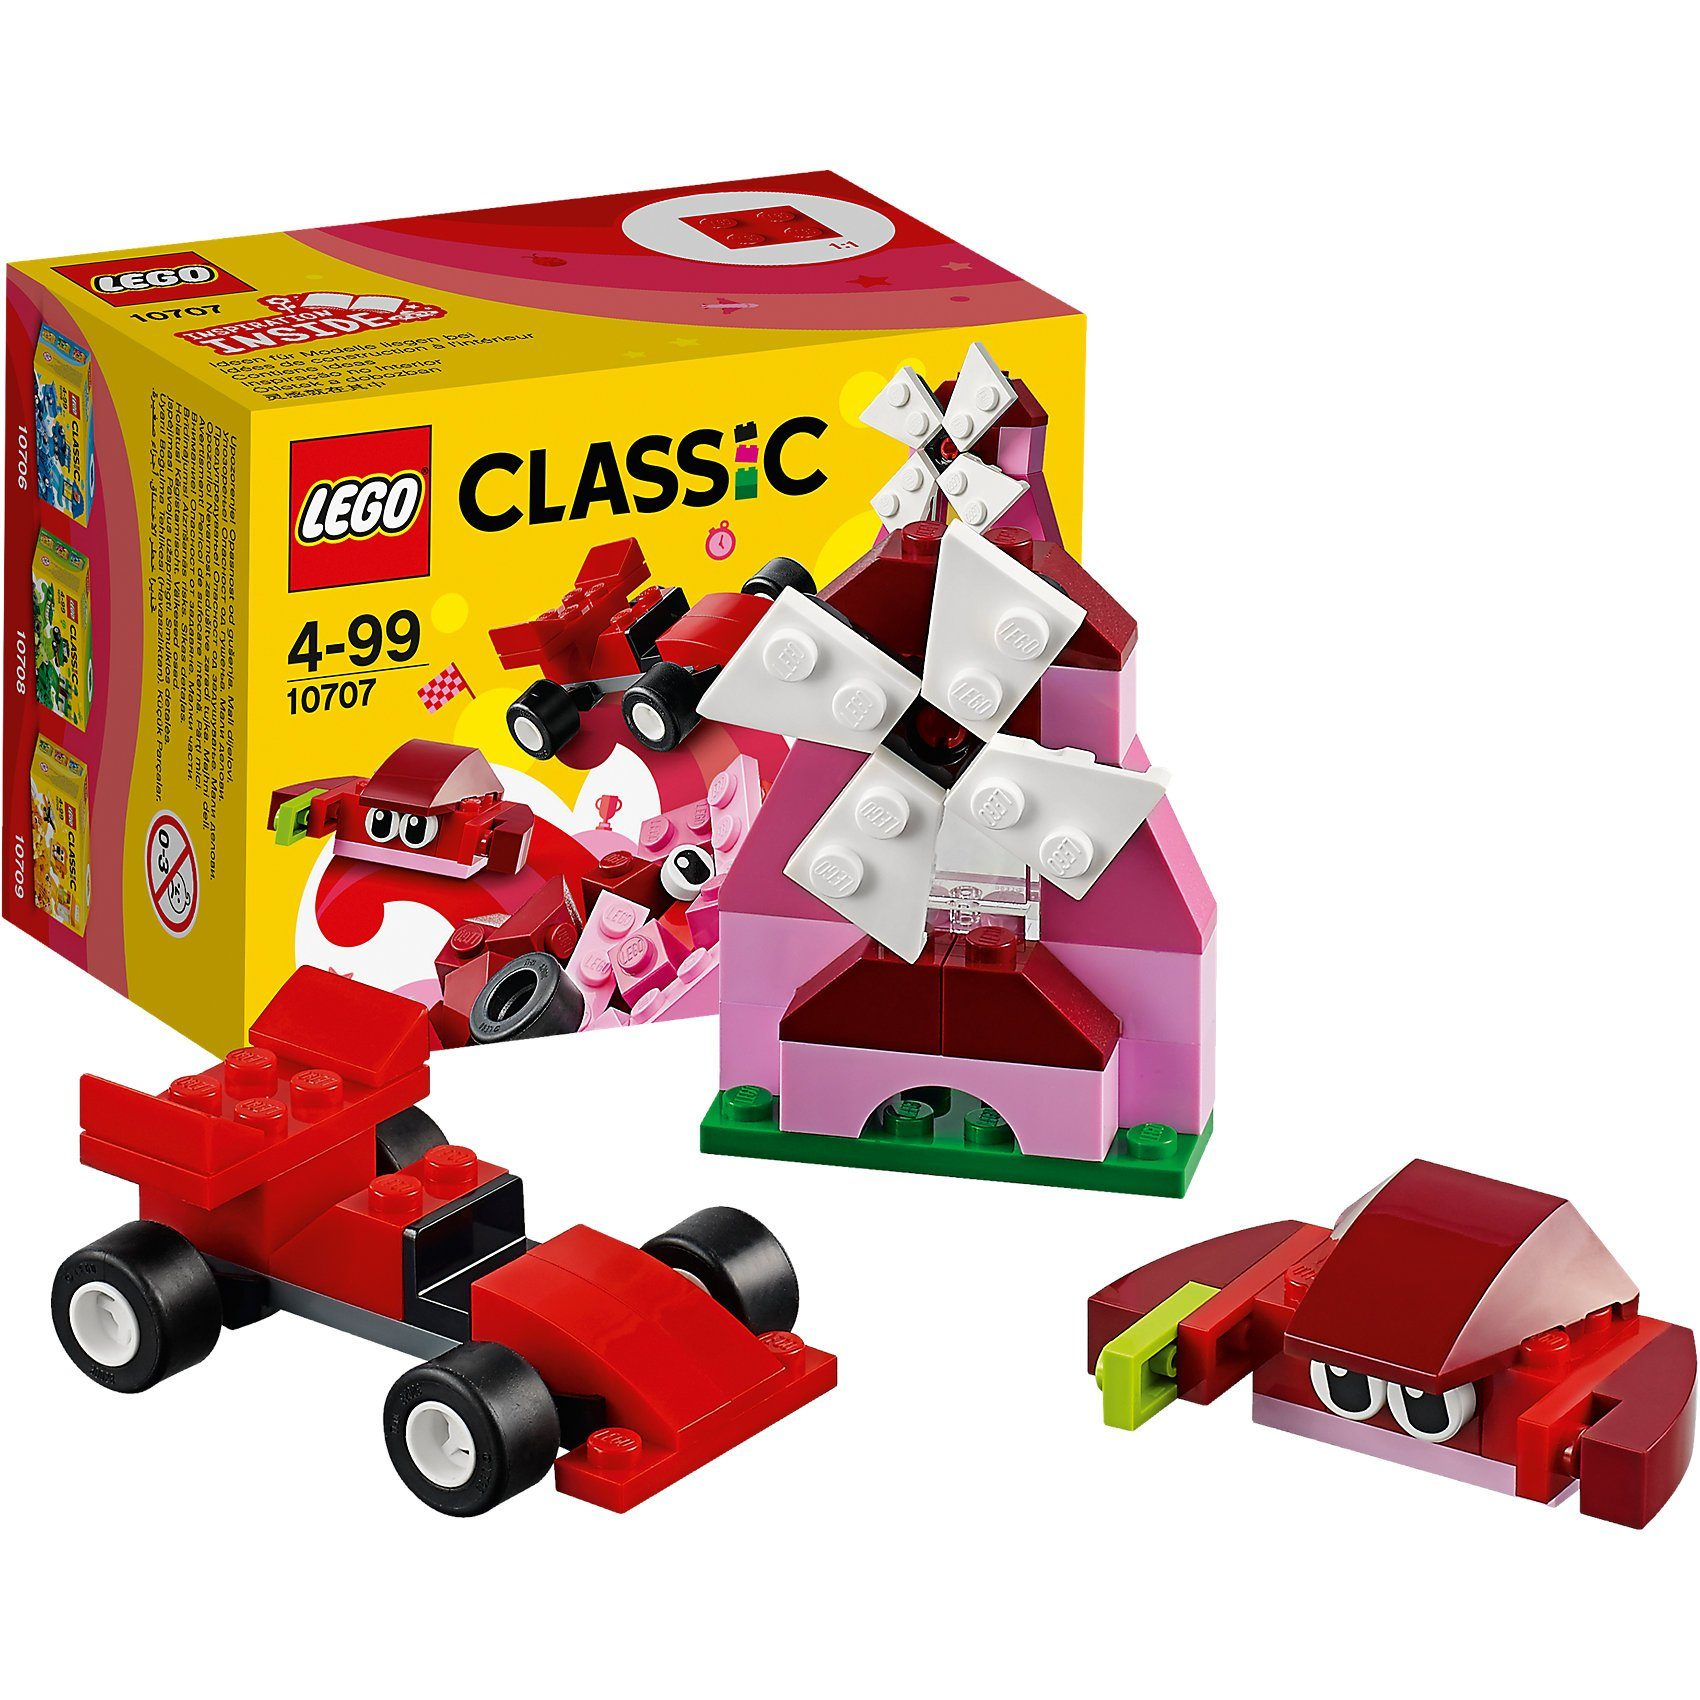 LEGO 10707 Classic: Kreativ-Box Rot